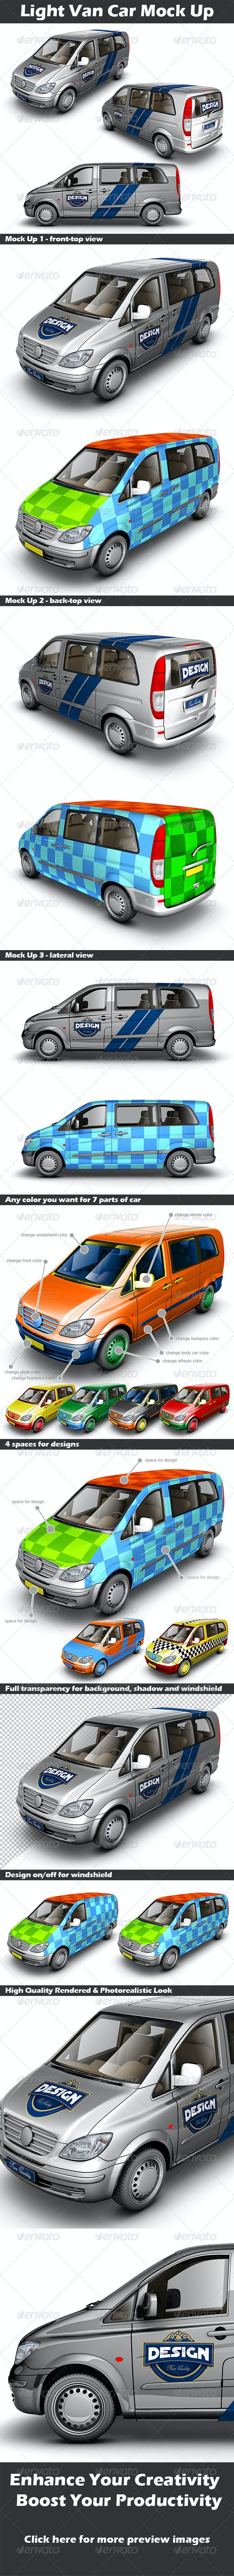 Light Van Car Mock Up - Vehicle Wraps Print